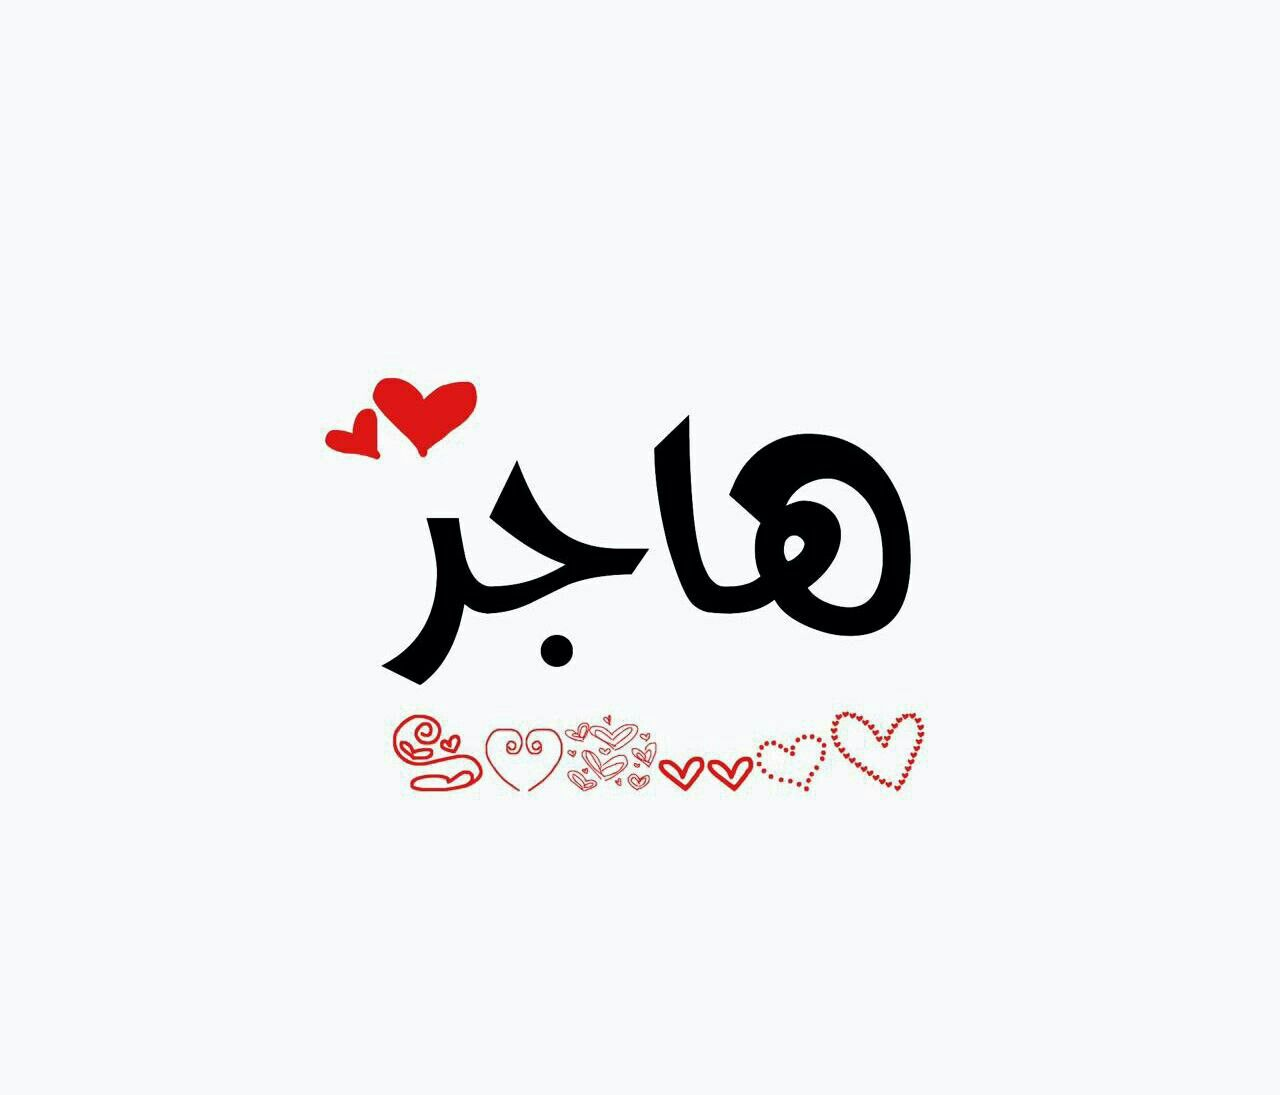 Pin By زهرة الياسمين On أسماء Islamic Art Calligraphy Islamic Wall Art Calligraphy Name